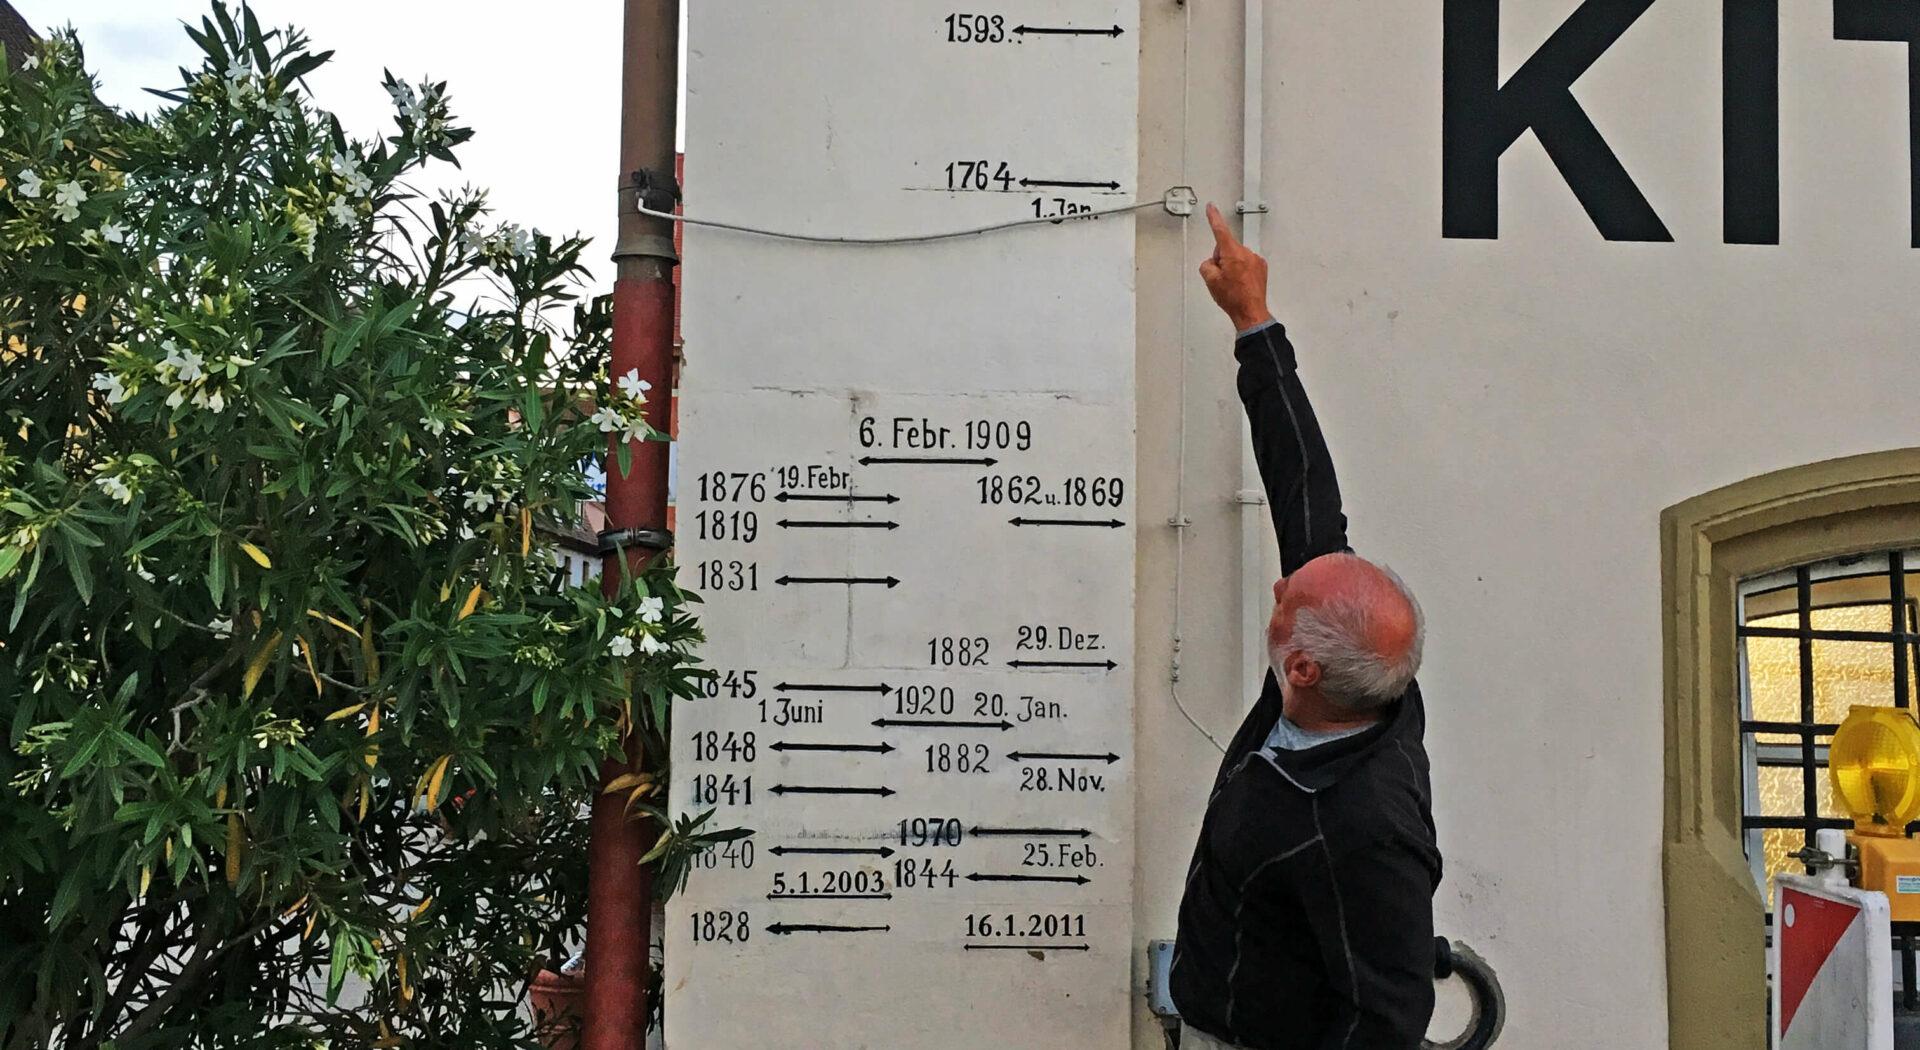 Kitzingen. Sten viser vannstandmåling